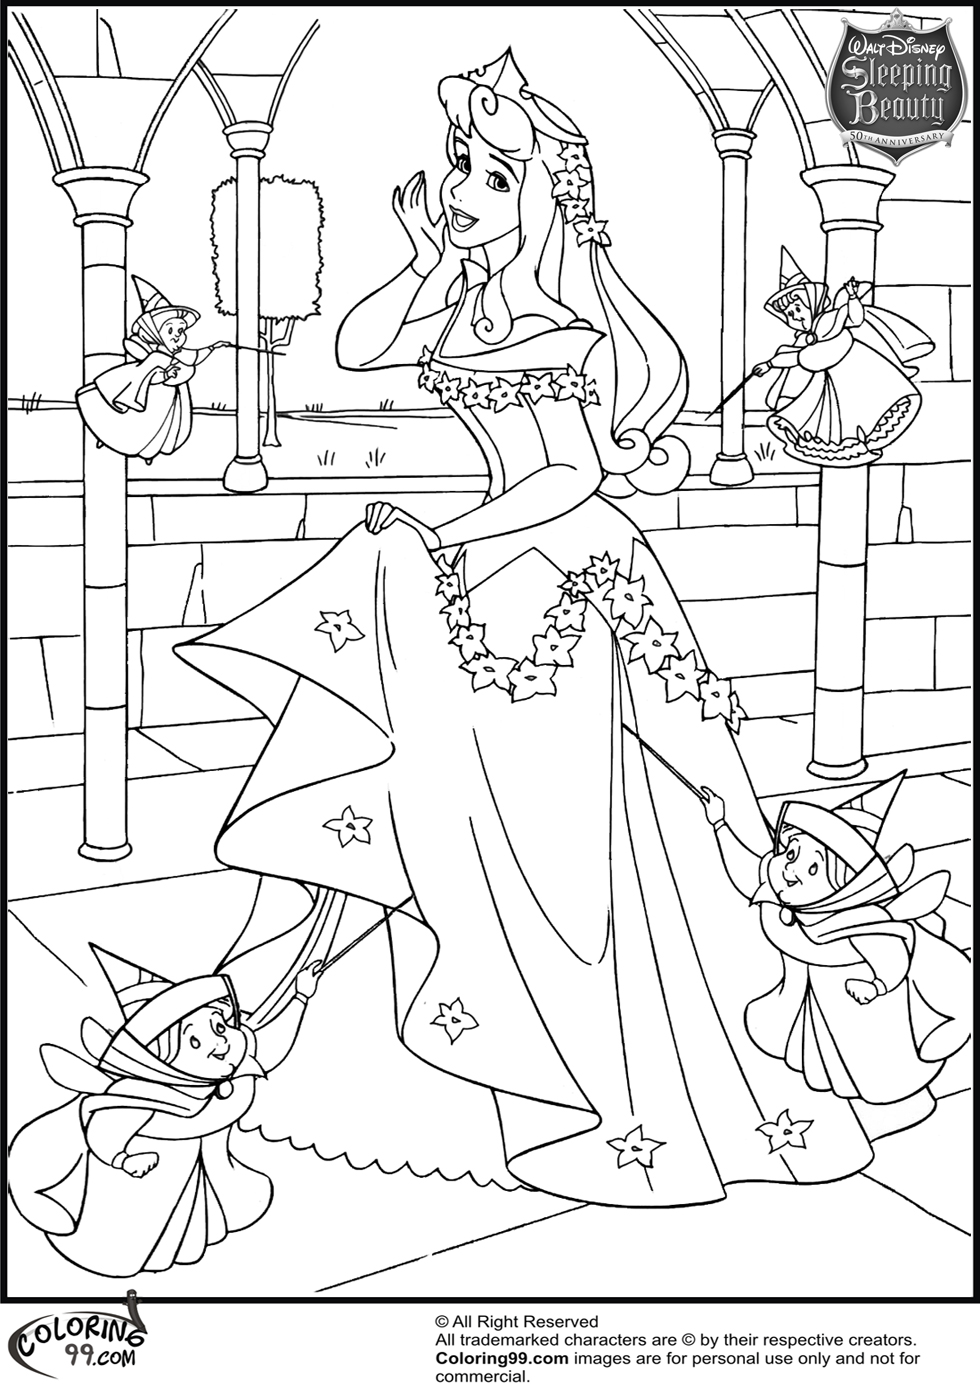 Disney Princess Aurora Coloring Pages | Team colors | coloring pages for disney princesses